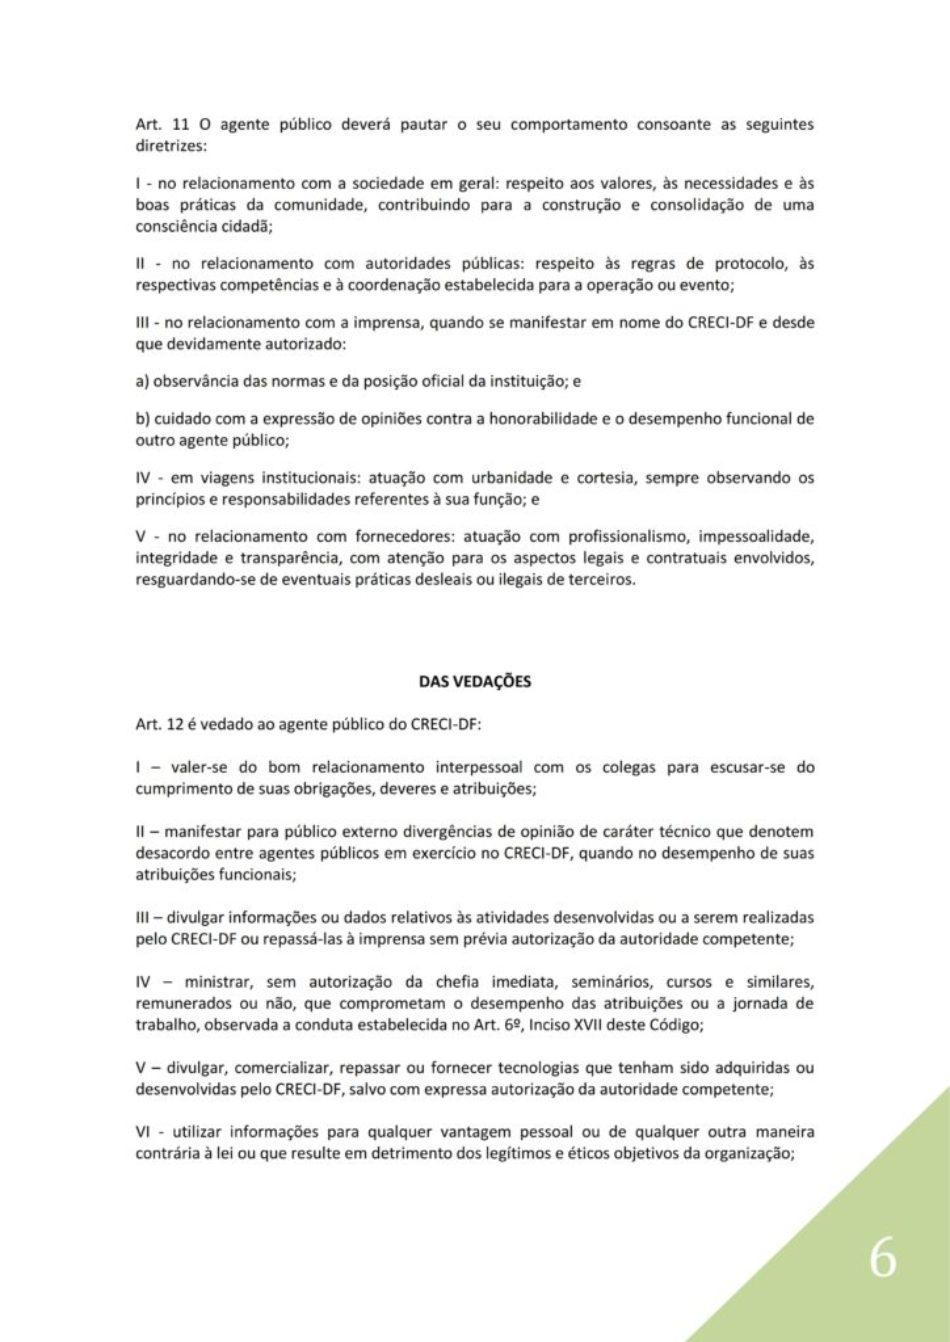 CÓDIGO DE CONDUTA ÉTICA.pdf_page_10